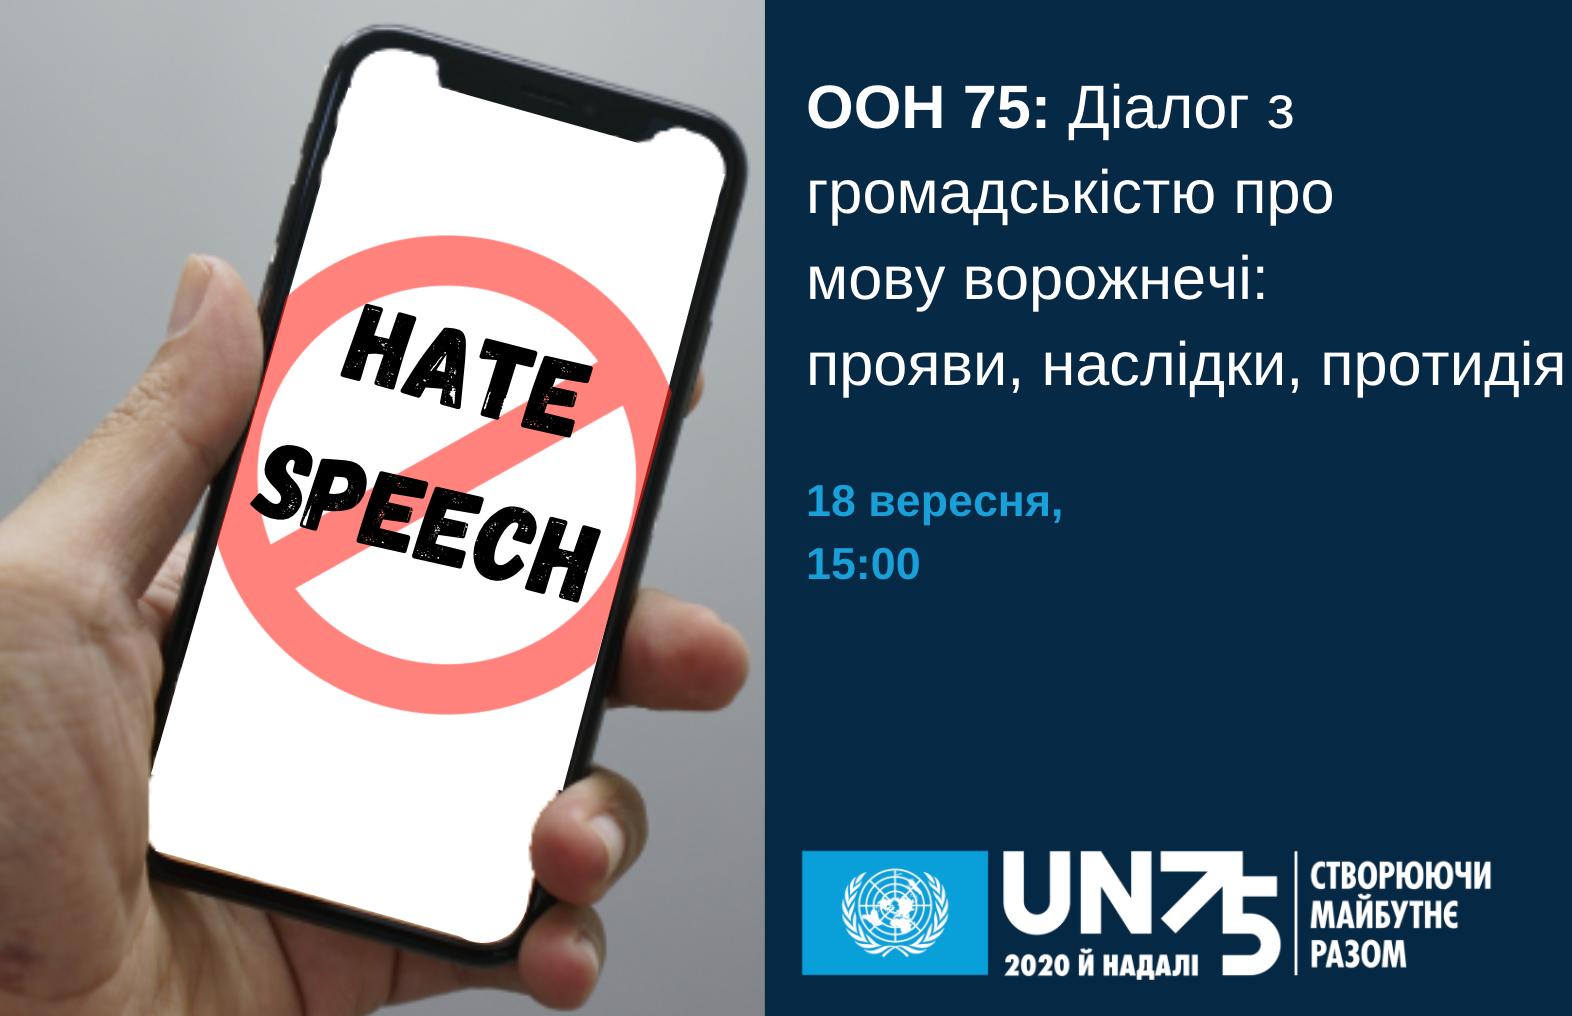 UN75: UN/CSO Dialogue on hate speech: manifestations, consequences, prevention